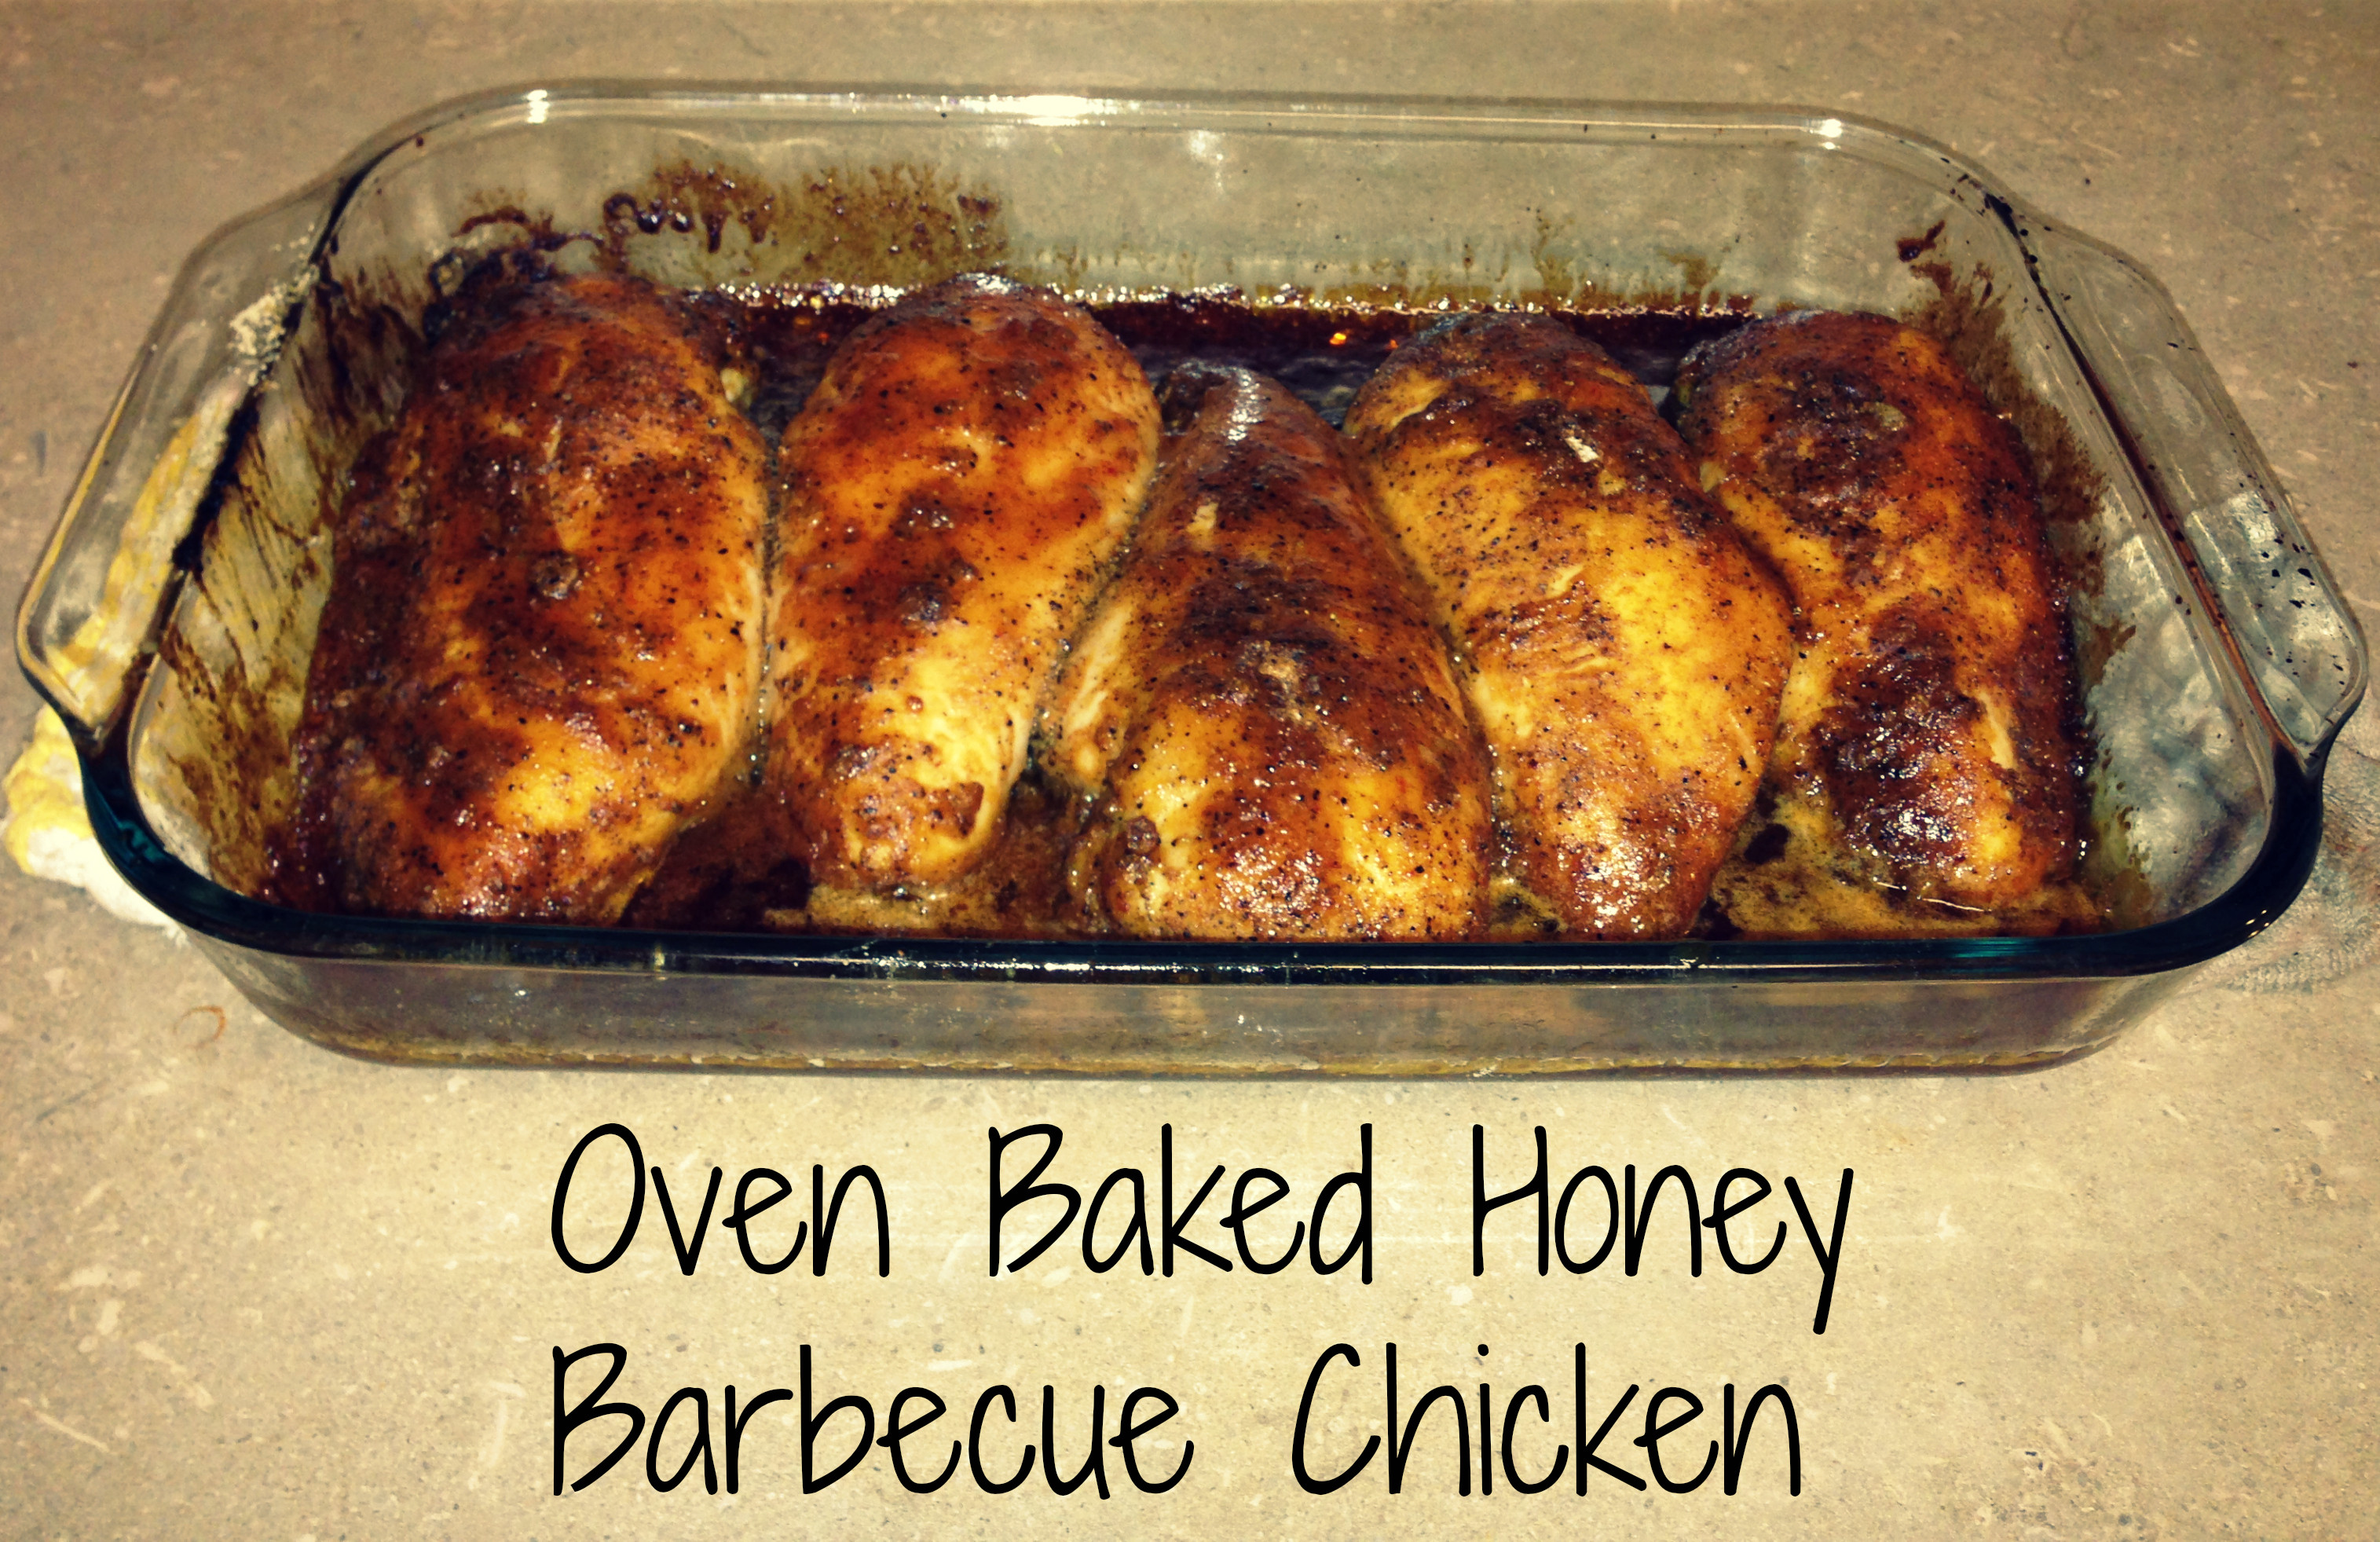 Oven Baked Bbq Boneless Chicken Breast  bbq boneless skinless chicken breasts